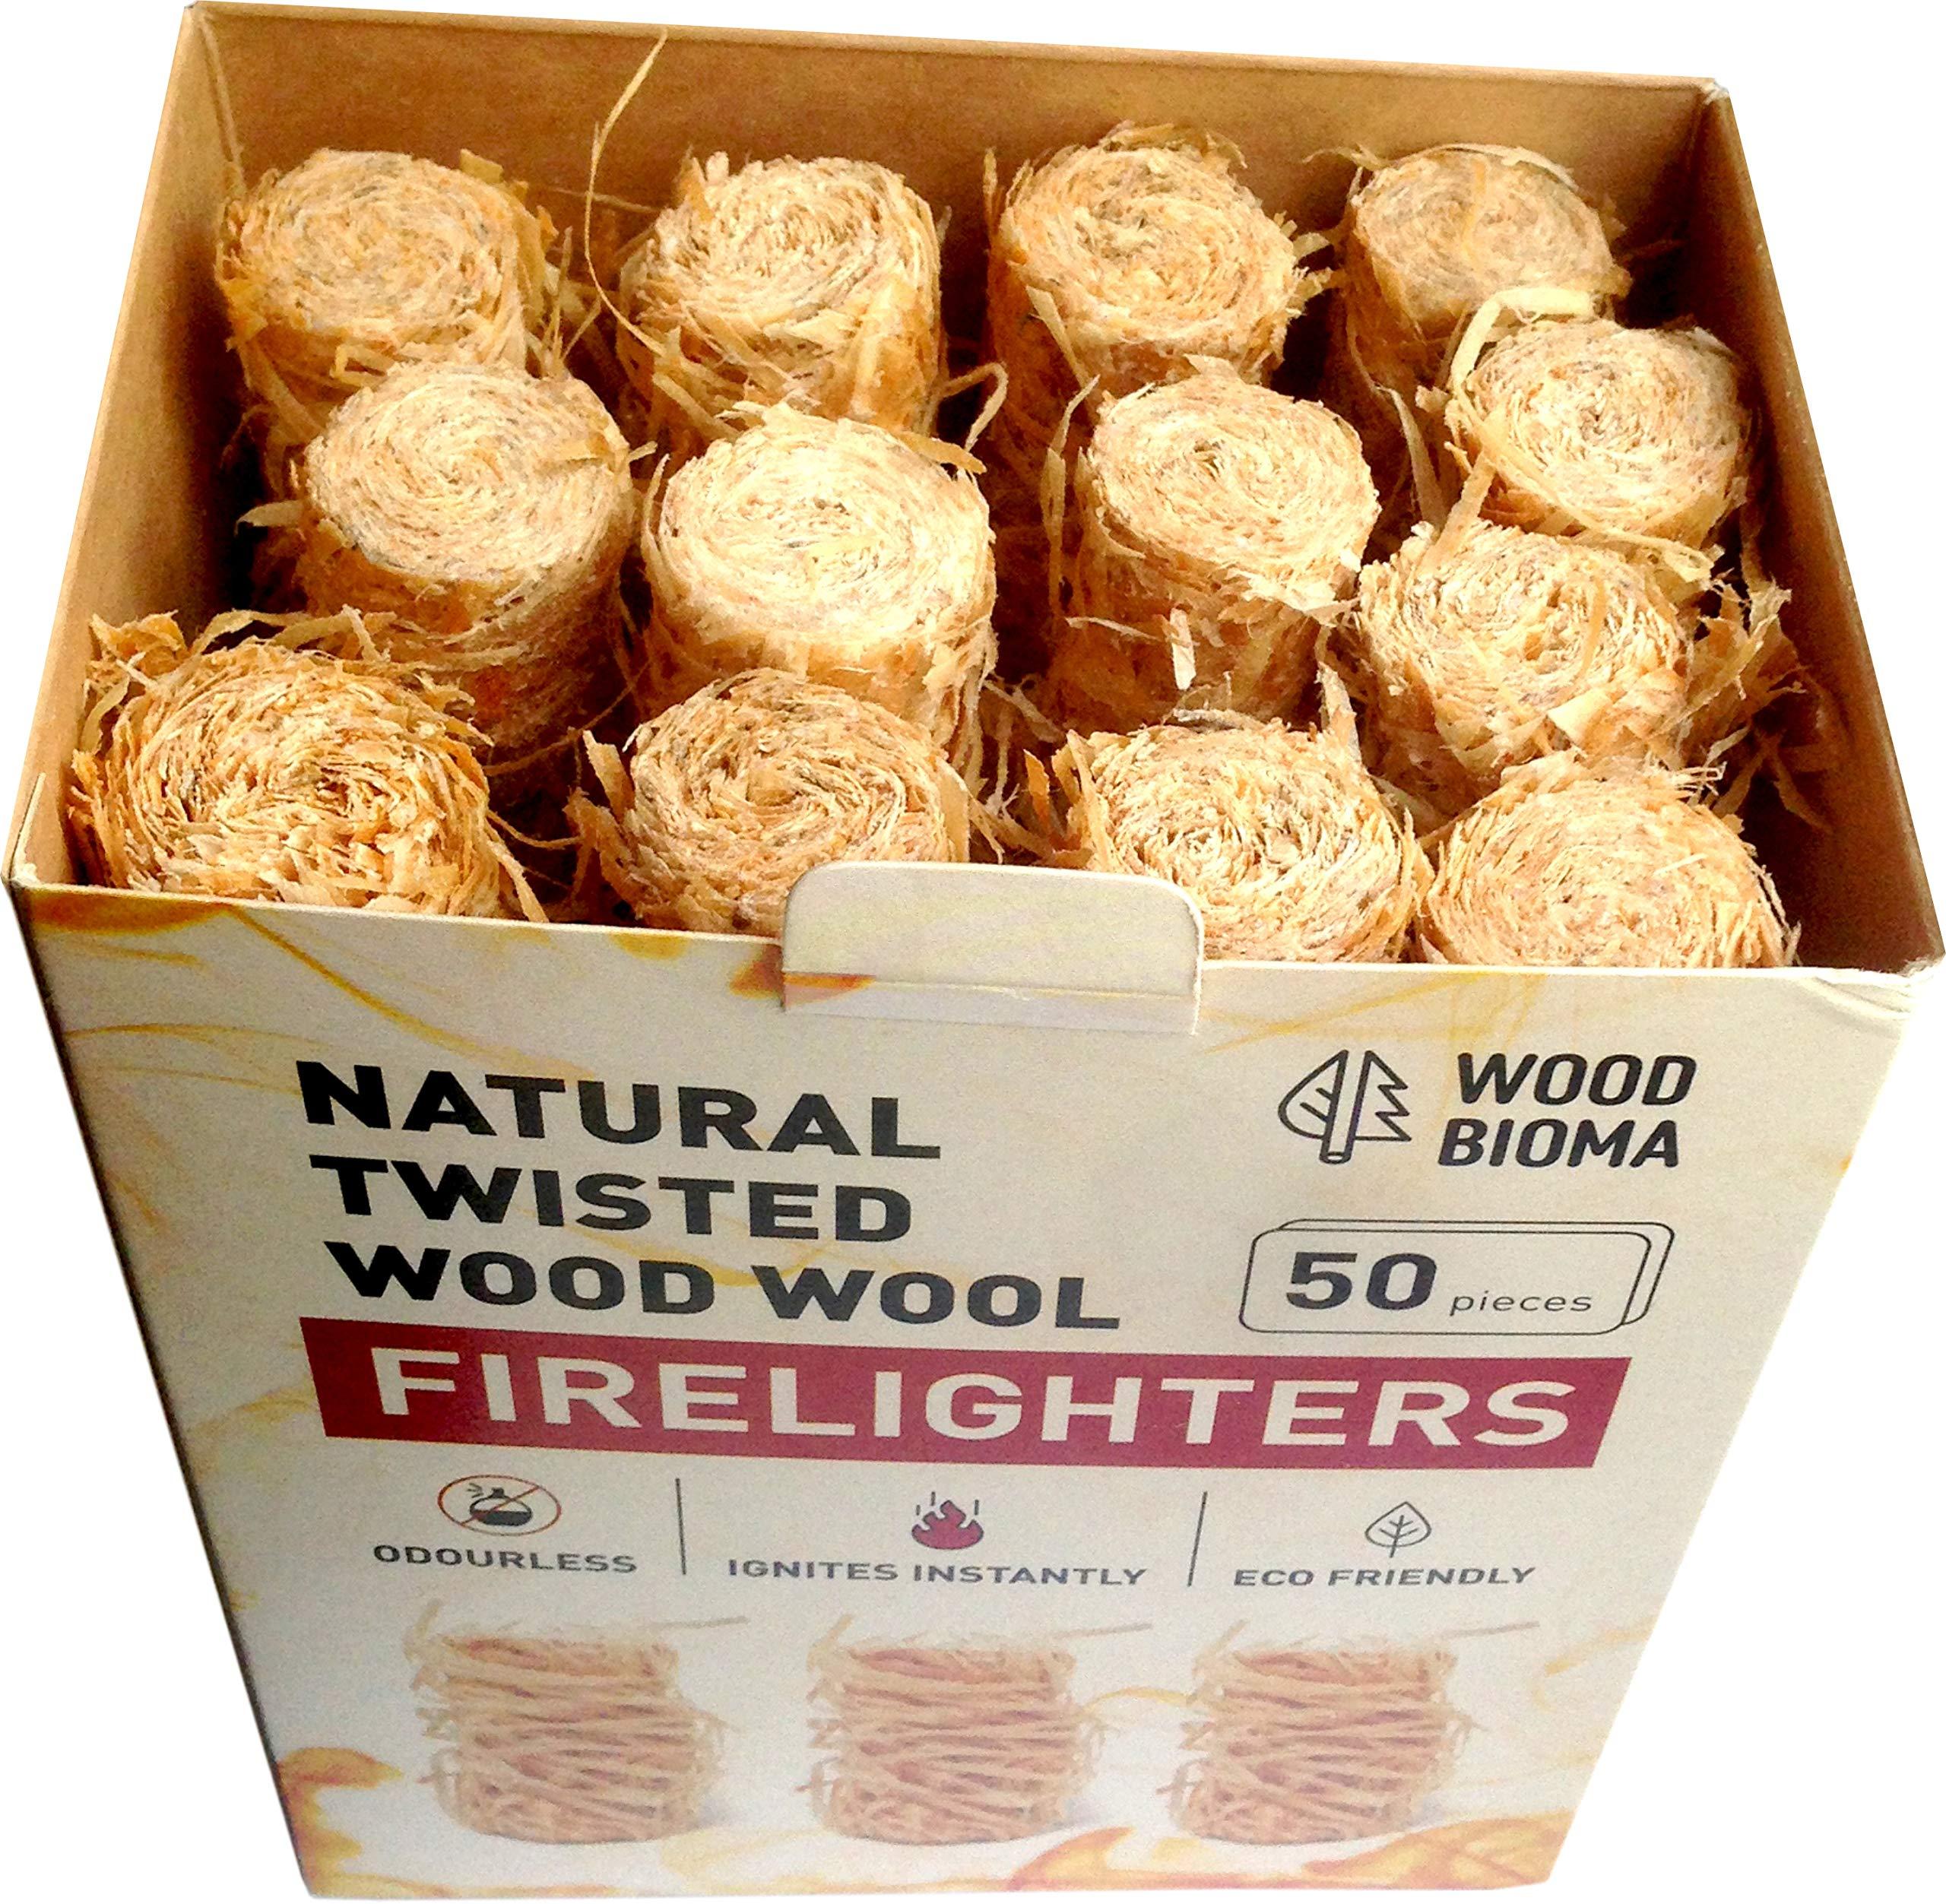 Natural Fire starter Wood Wool Firelighters 50 pcs Charcoal starter Duraflame Kamado Joe Big Green Egg Kindle Fire Fireplace Primo Smoker BBQ Pizza oven, by Woodbioma